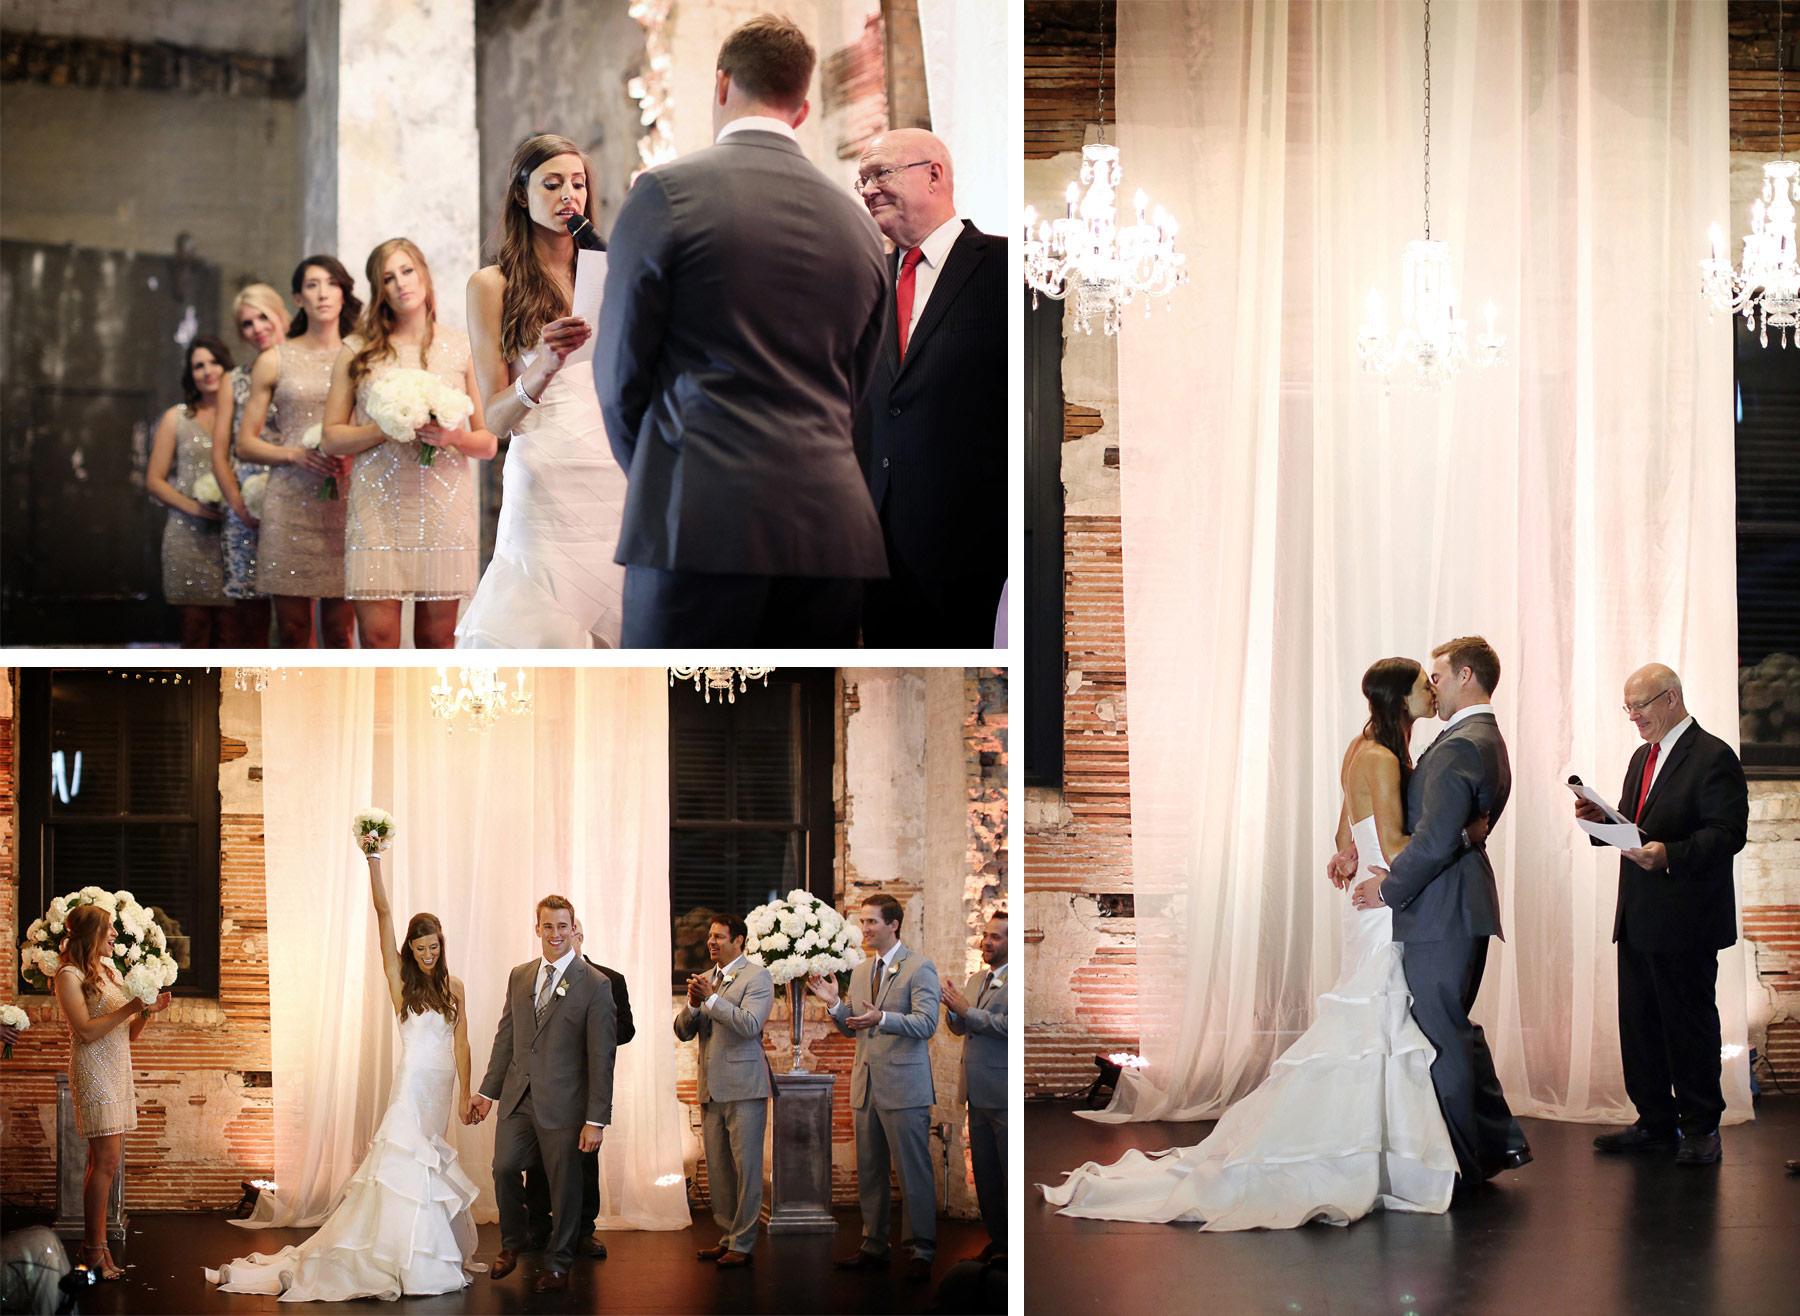 12-Minneapolis-Minnesota-Wedding-Photography-by-Vick-Photography-Aria-Ceremony-Katie-&-Joe.jpg